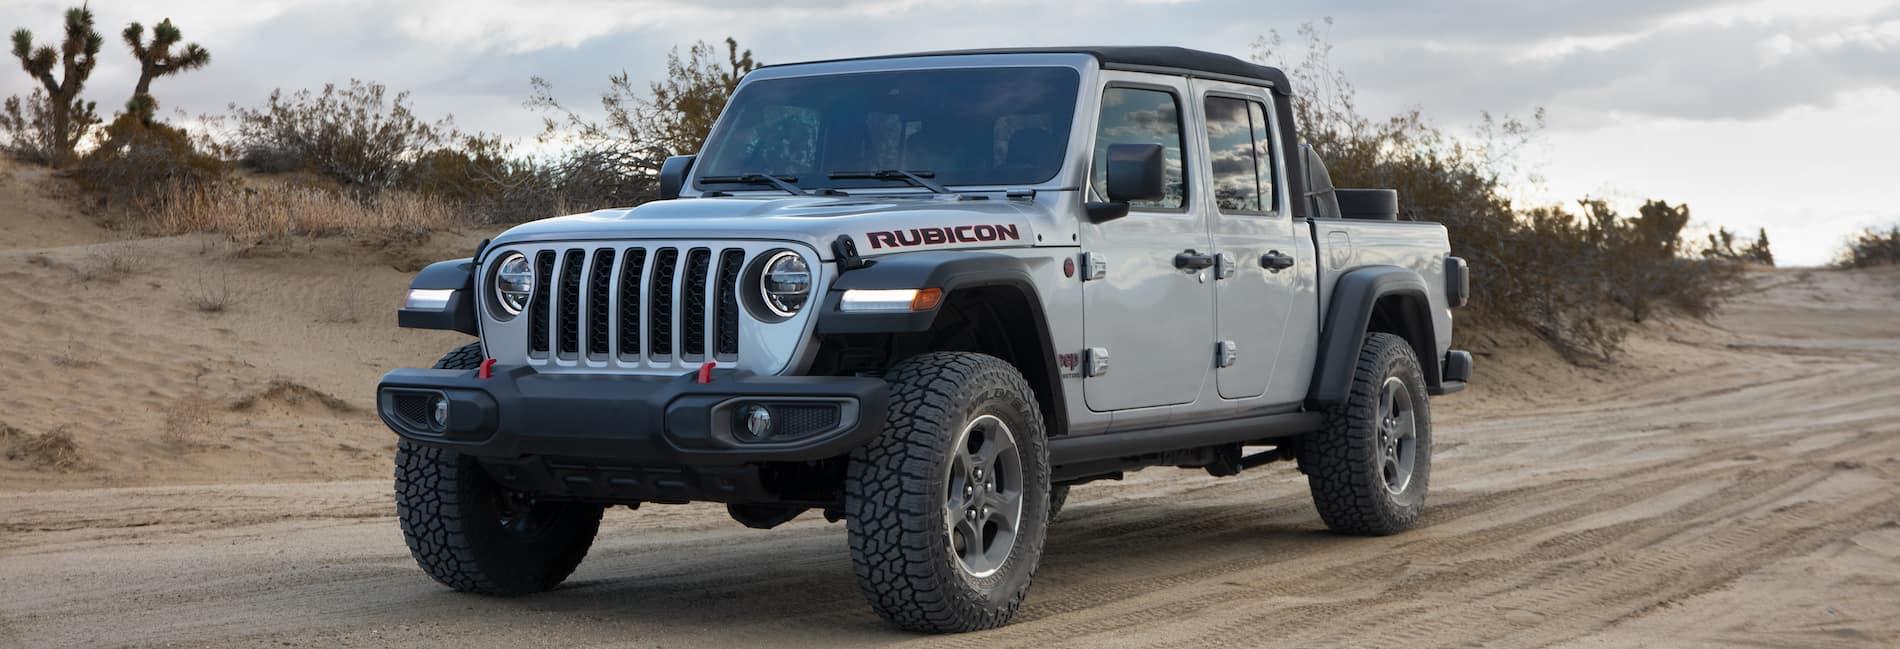 Jeep Gladiator Banner